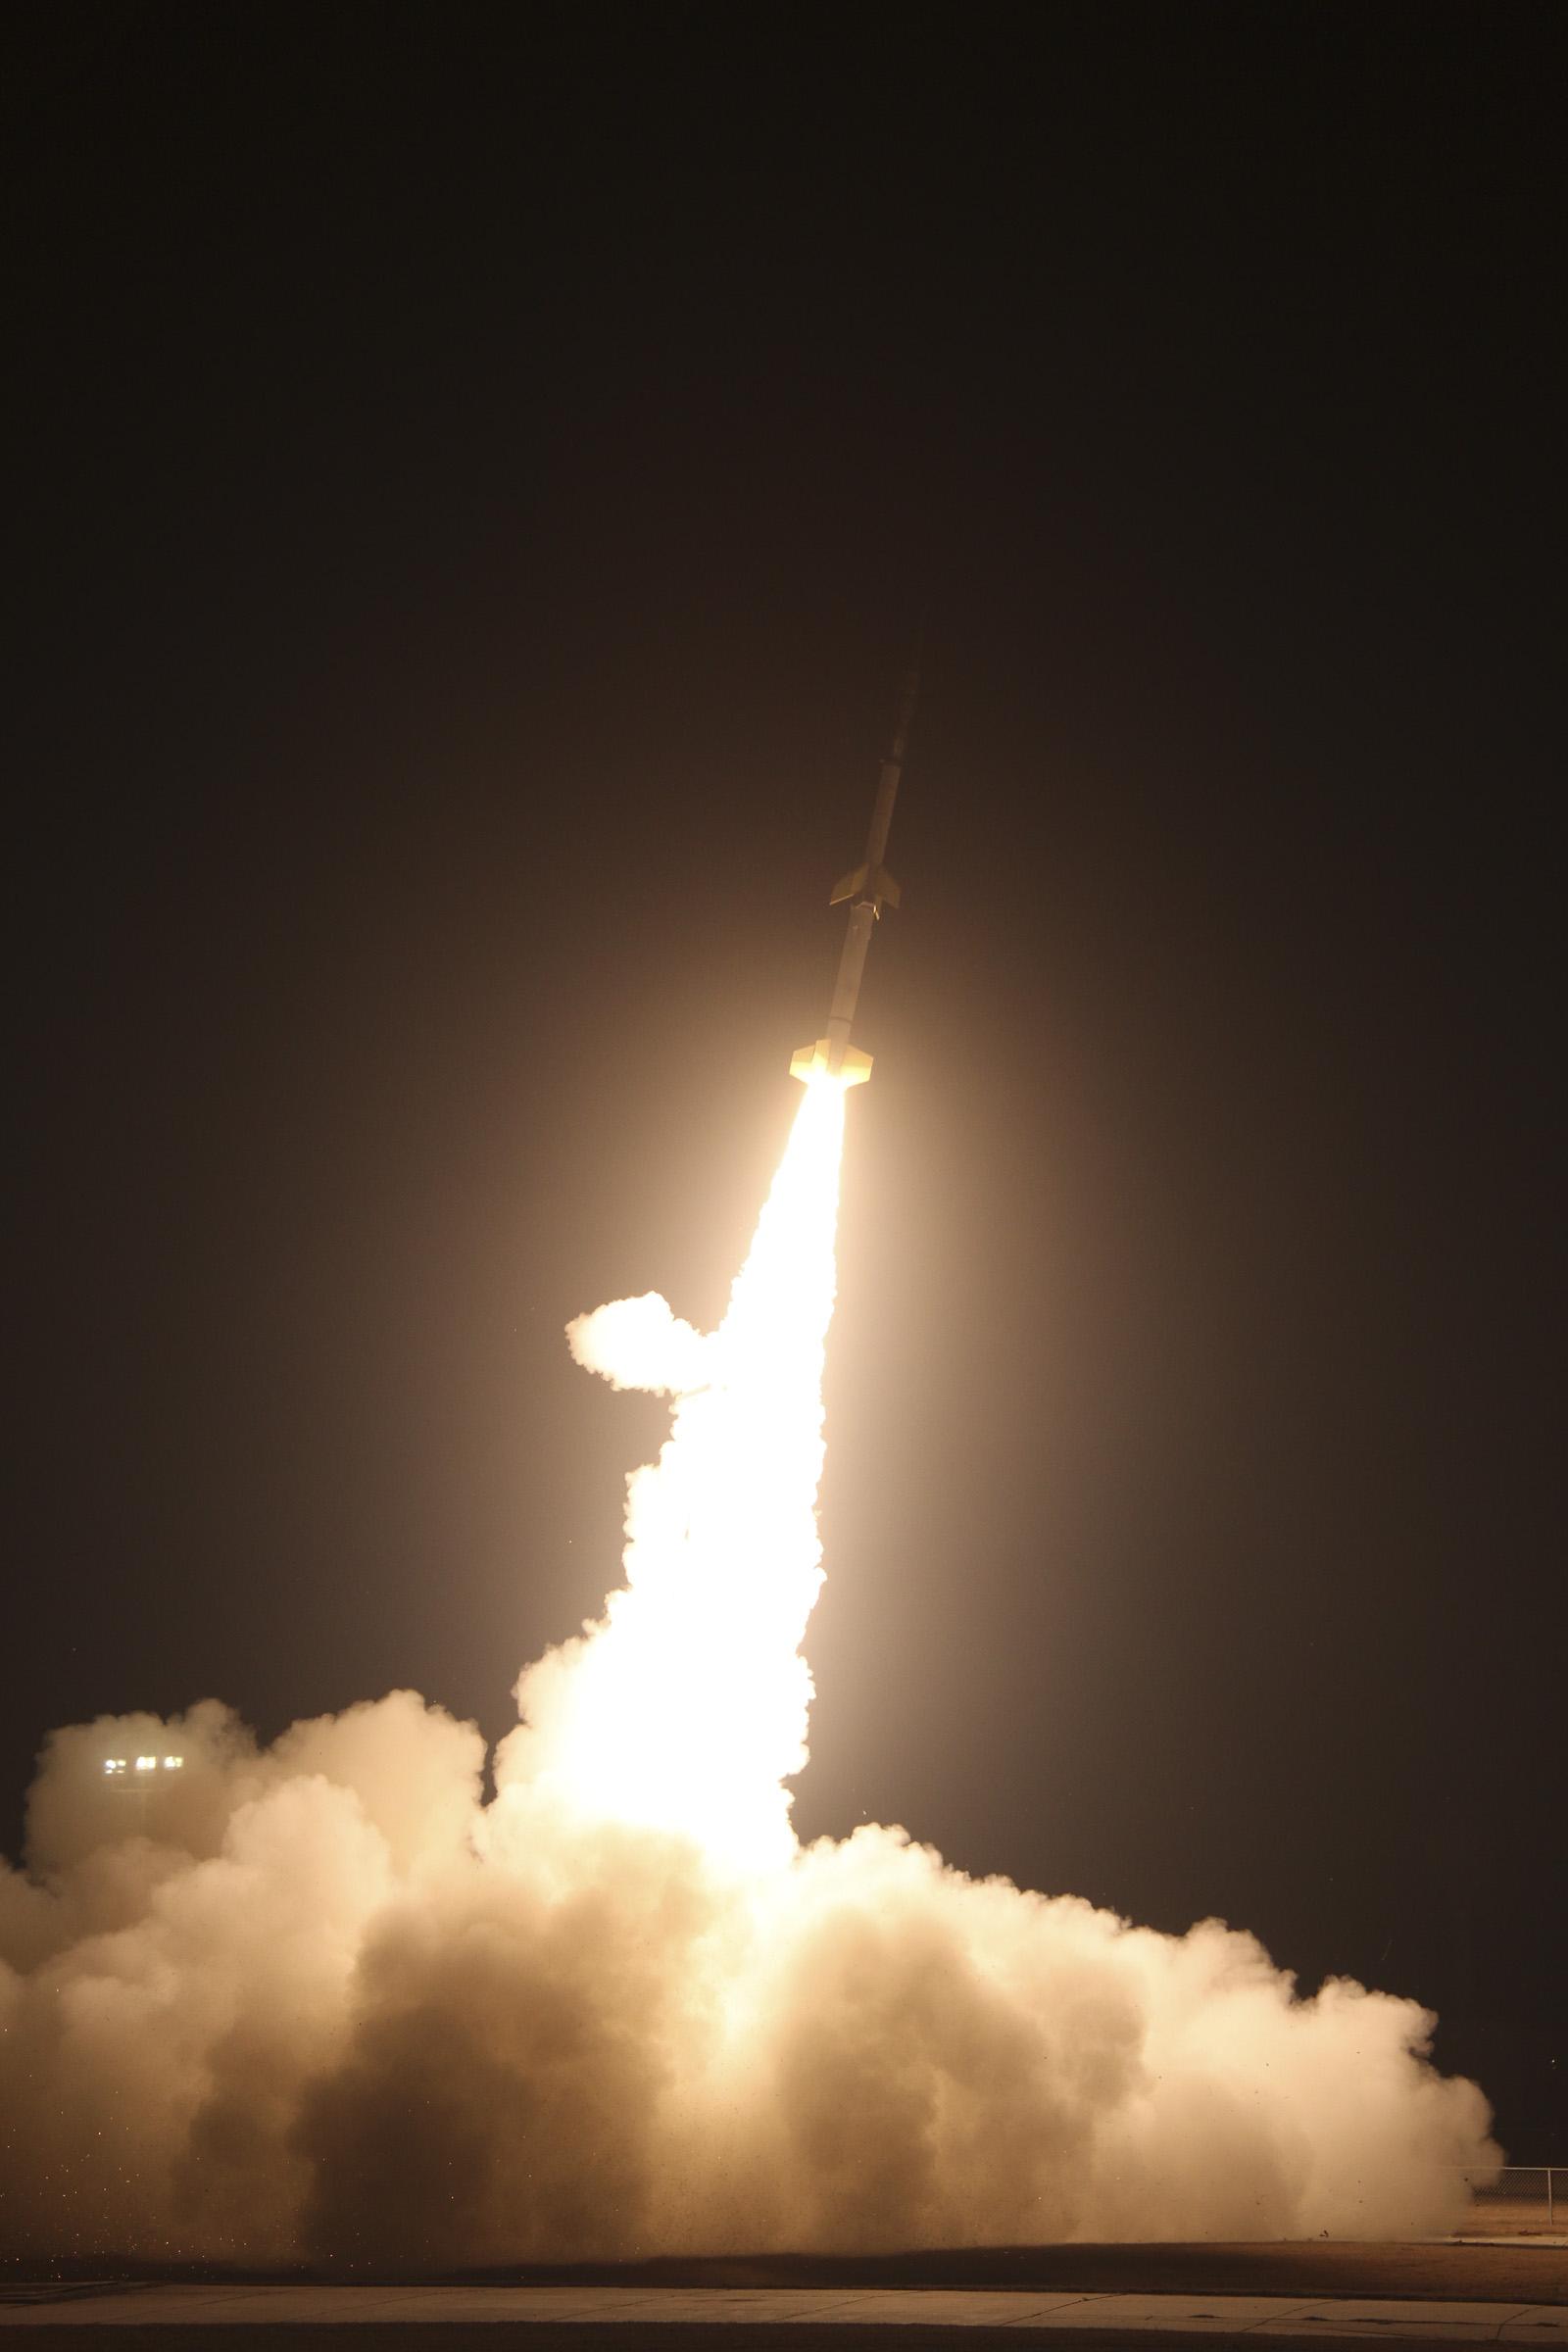 nasa wallops rocket launch - photo #45